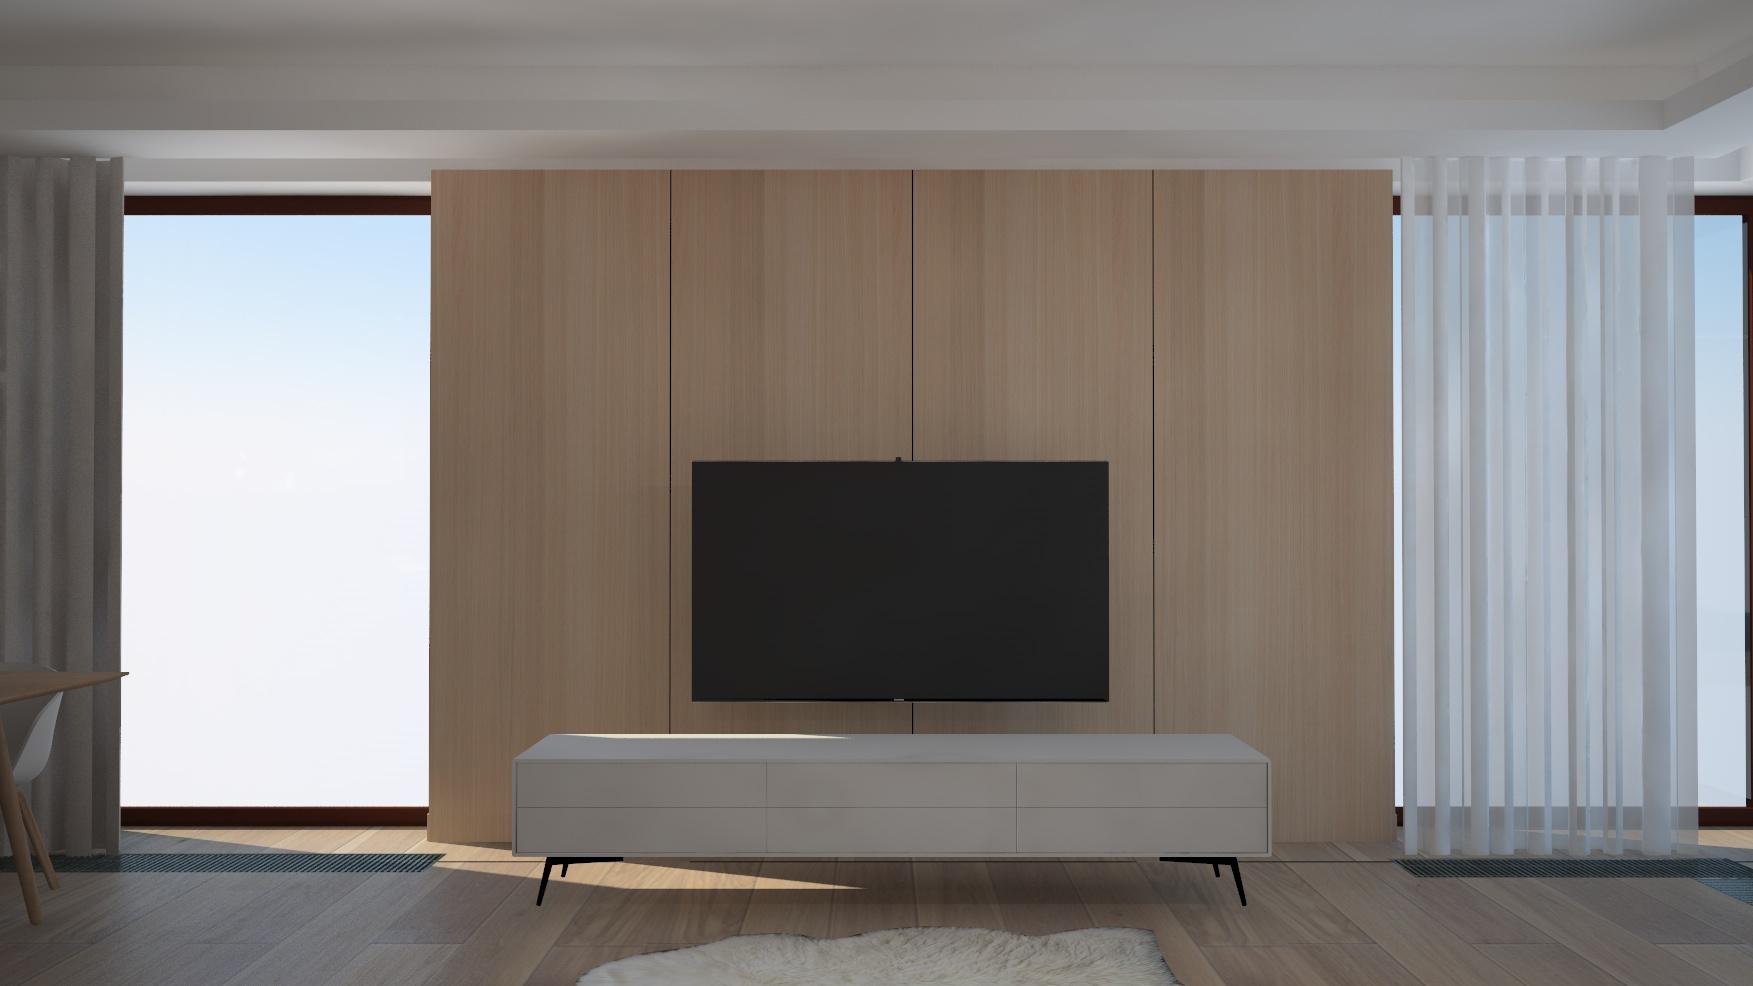 szafka rtv-bo concept-panele fornirowane-naturalne materiały.jpg